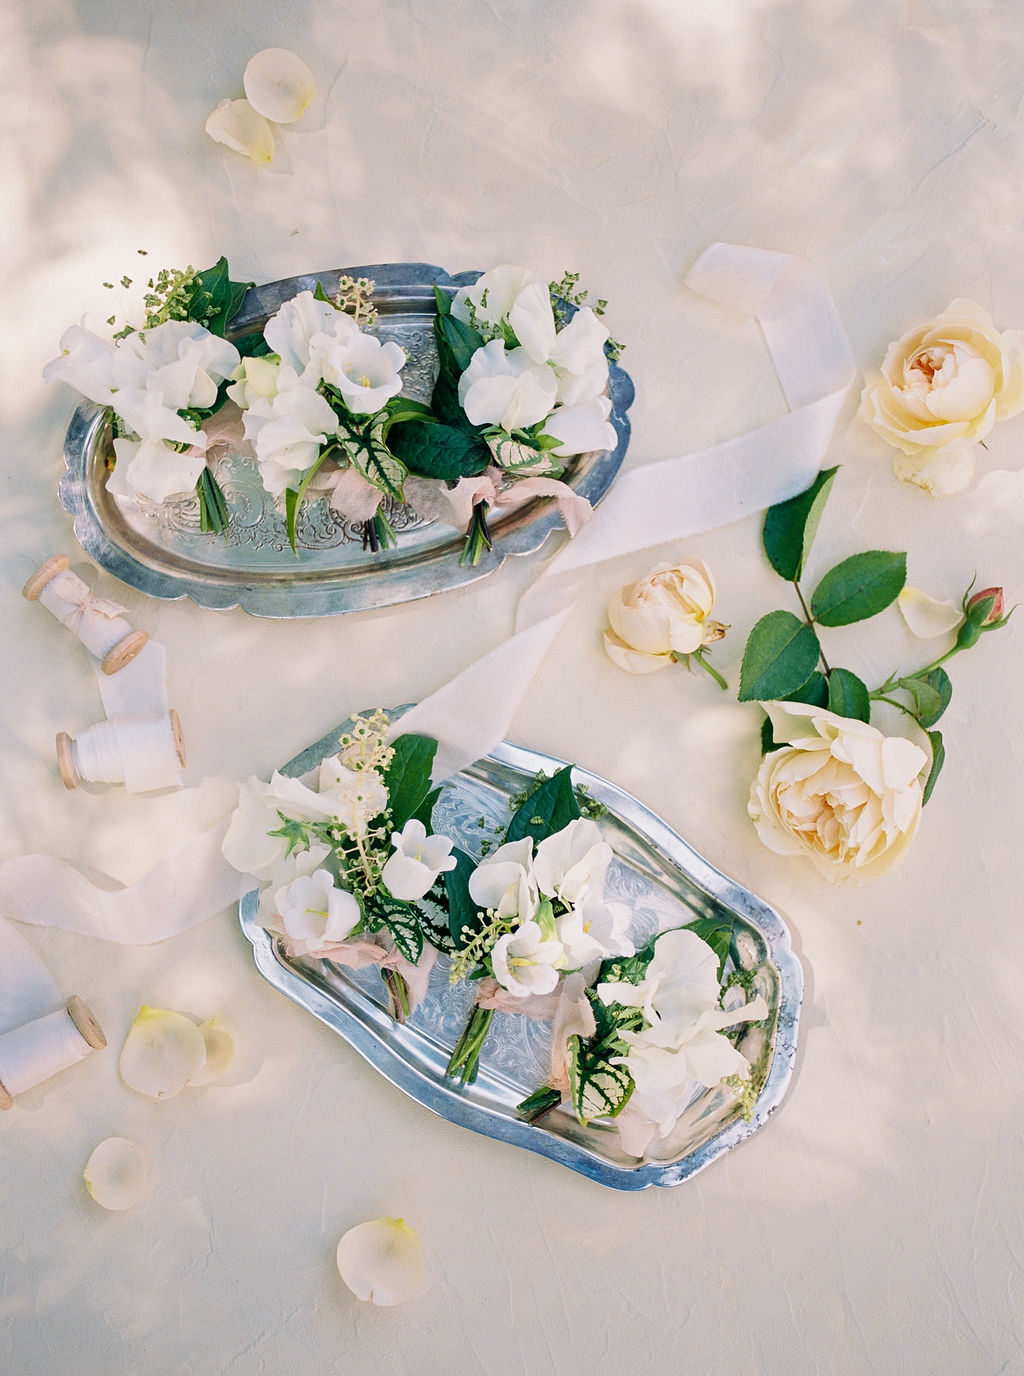 Alexandra-Elise-Photography-Film-Wedding-Photographer-Sonnenberg-Gardens-Finger-Lakes-Canandaigua-Reception-001.jpg